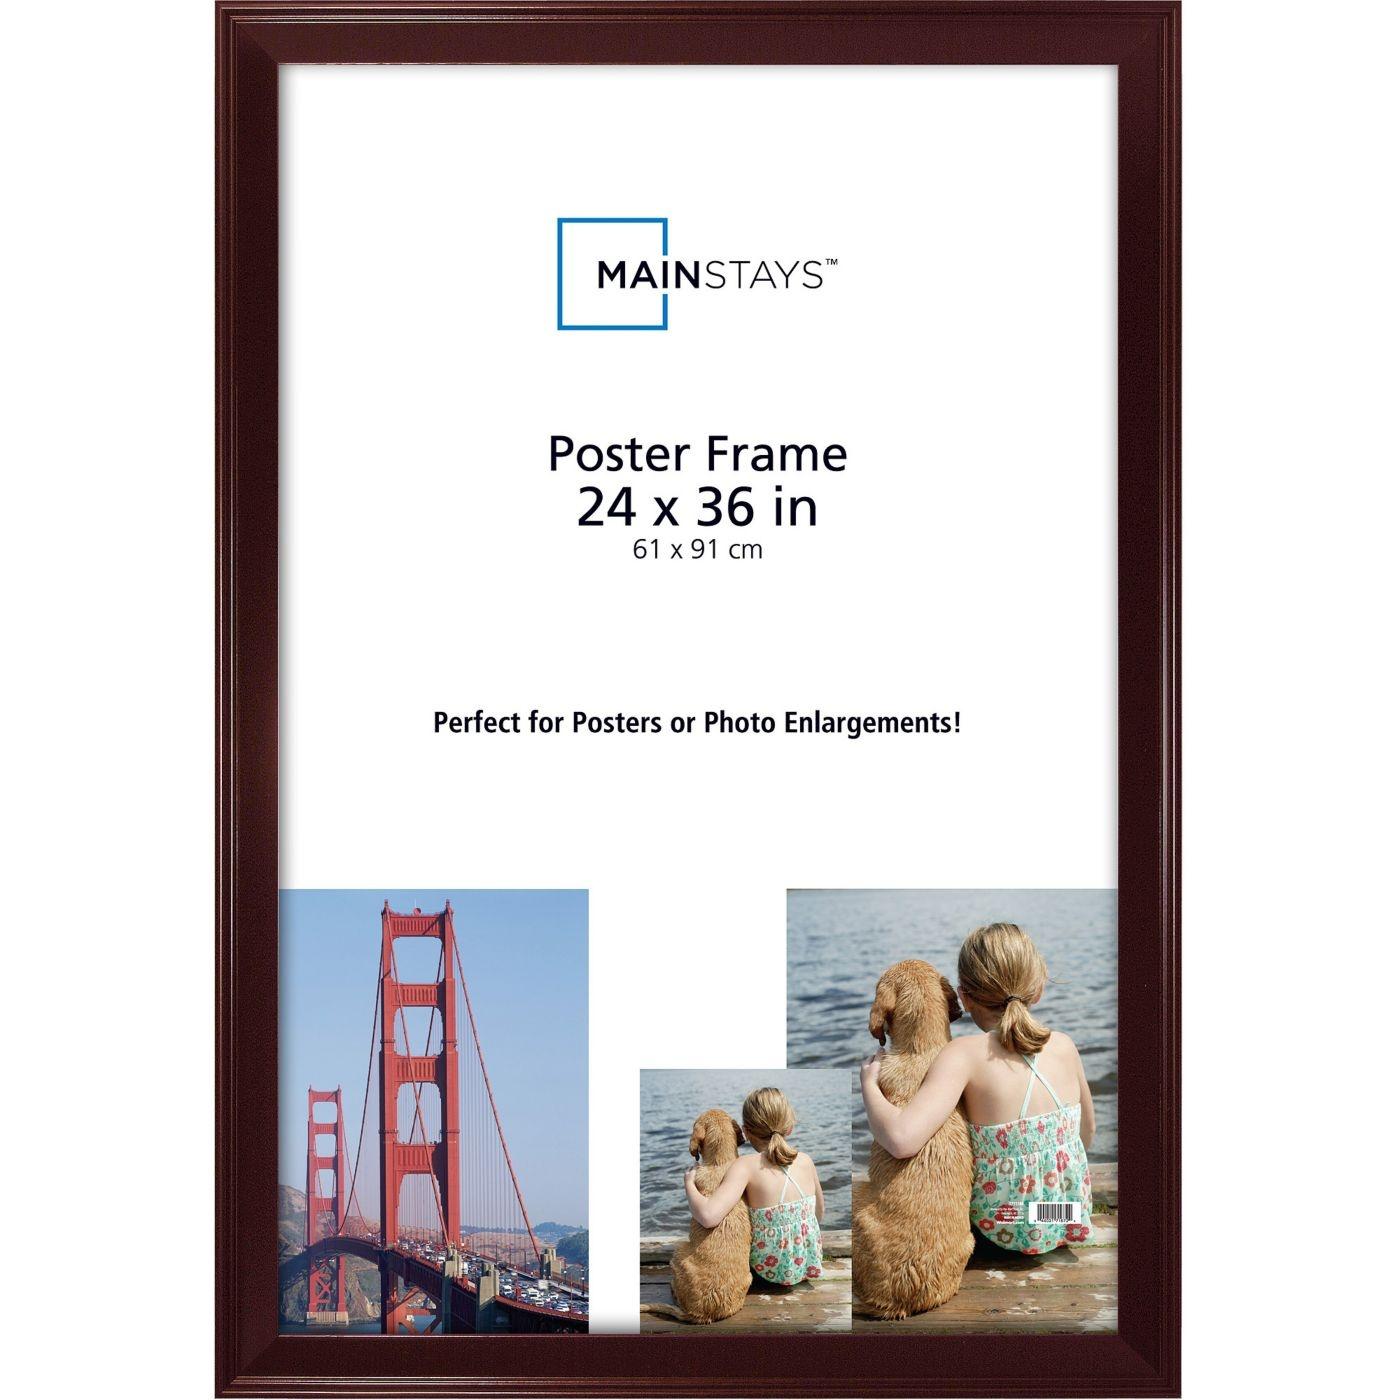 24 X 36 Poster Frame Homeware: Buy Online from Fishpond.com.au